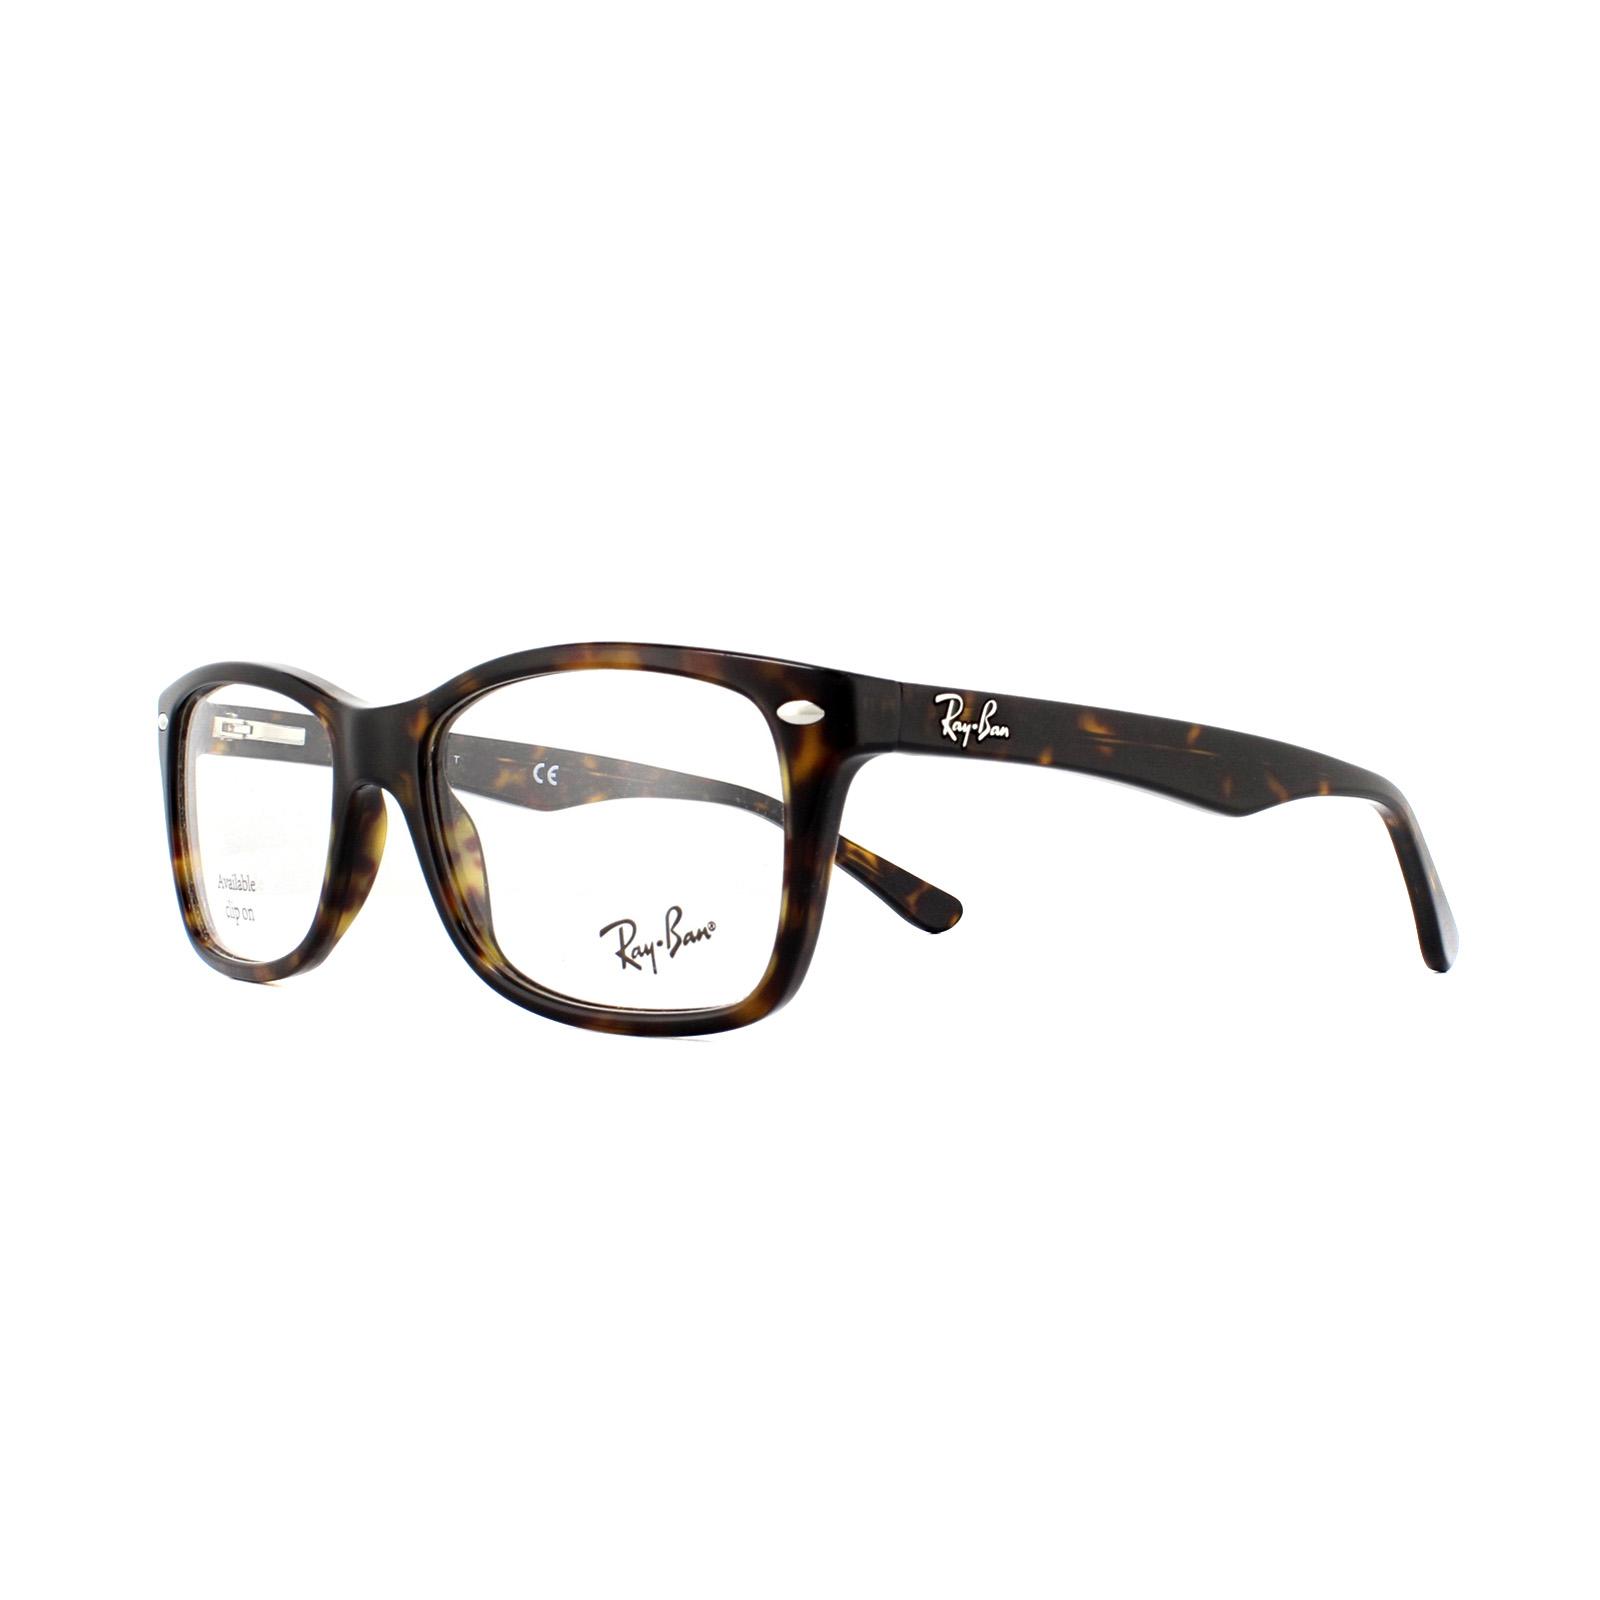 4669236d562 Cheap Ray-Ban Glasses Frames 5228 2012 Dark Havana 50mm - Discounted ...